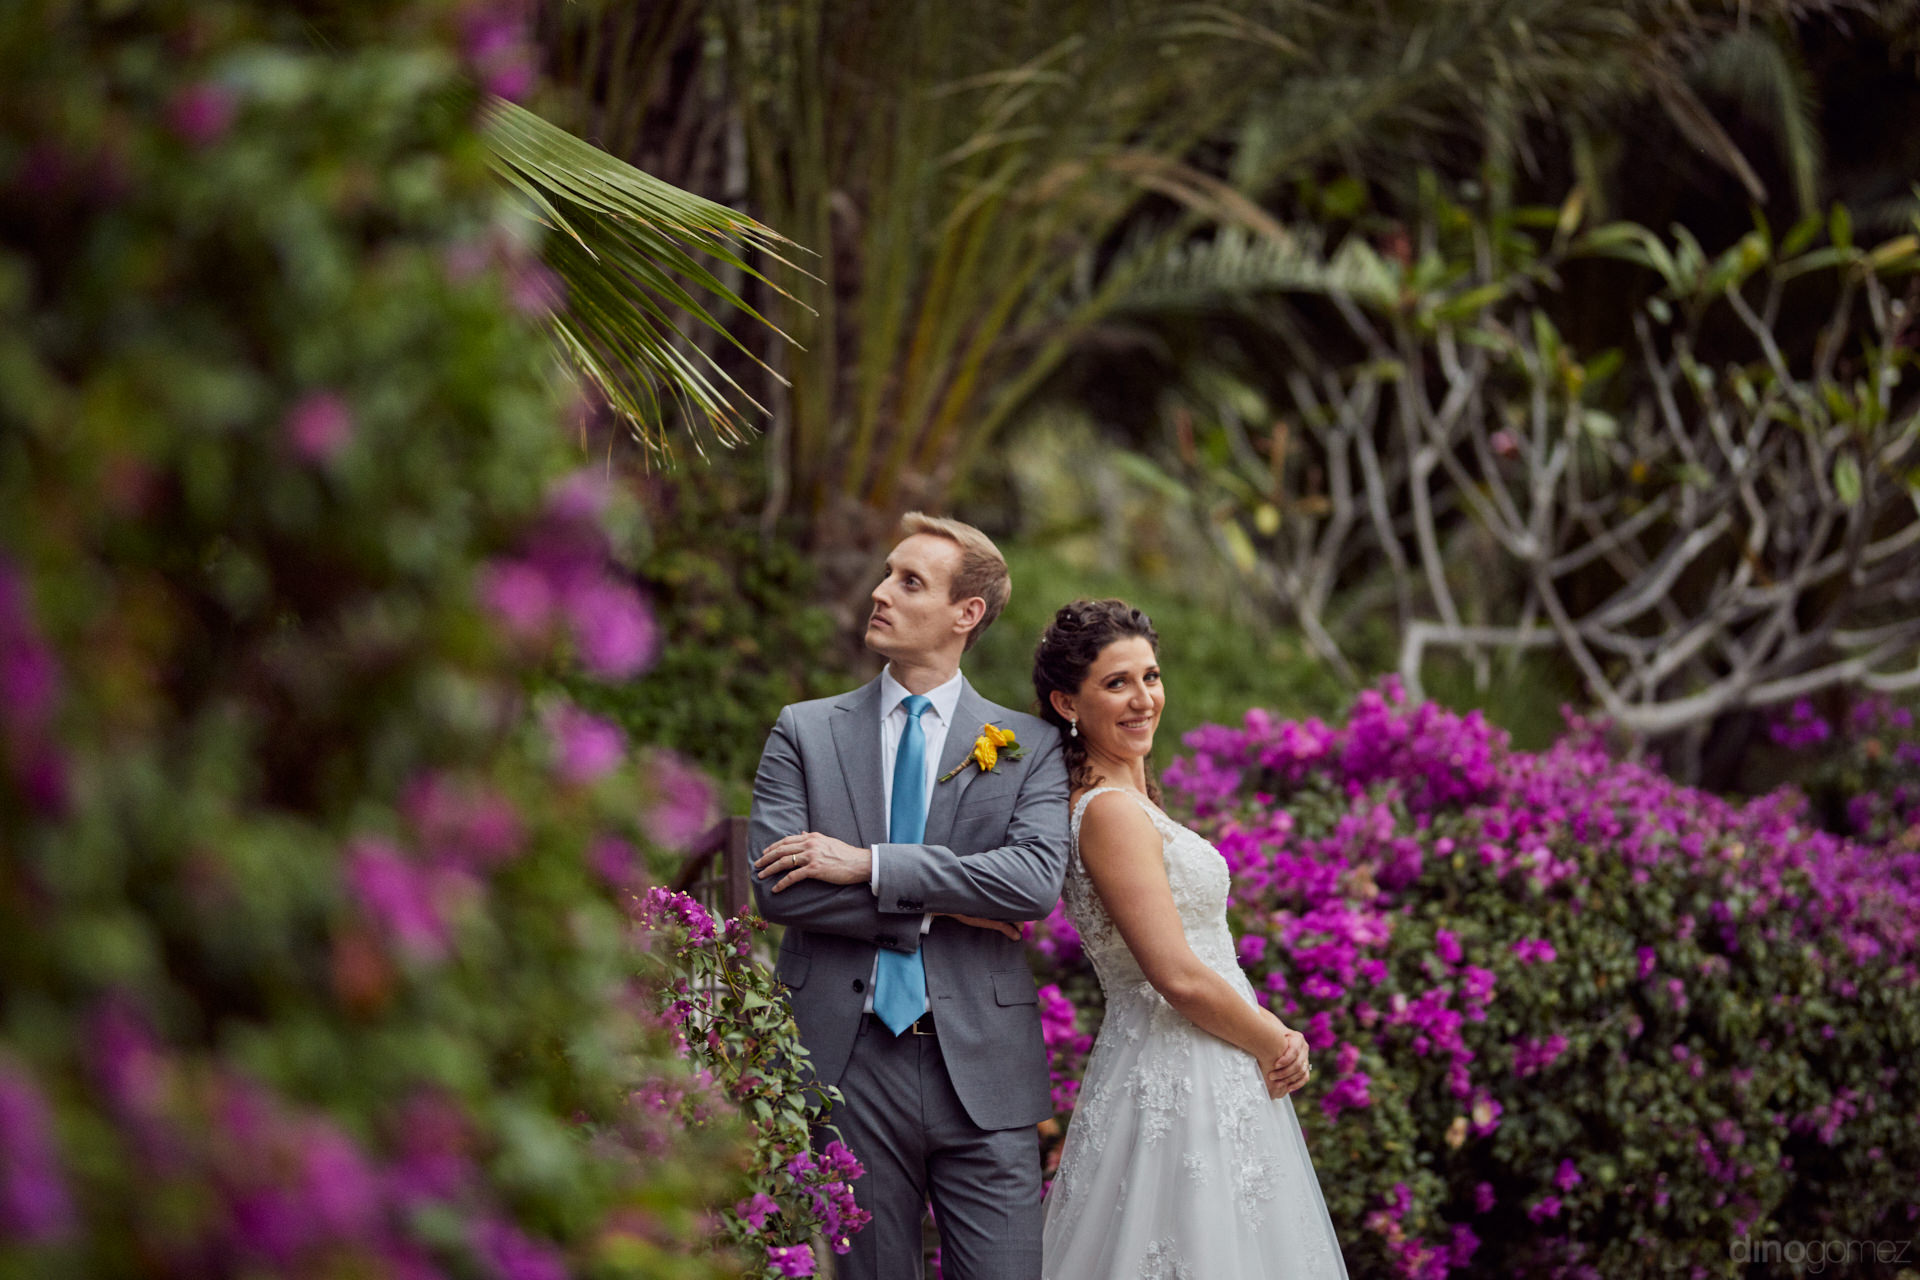 Celebrity Wedding Photographer Dino Gomez - Hilary & Bryan Flora Wedding